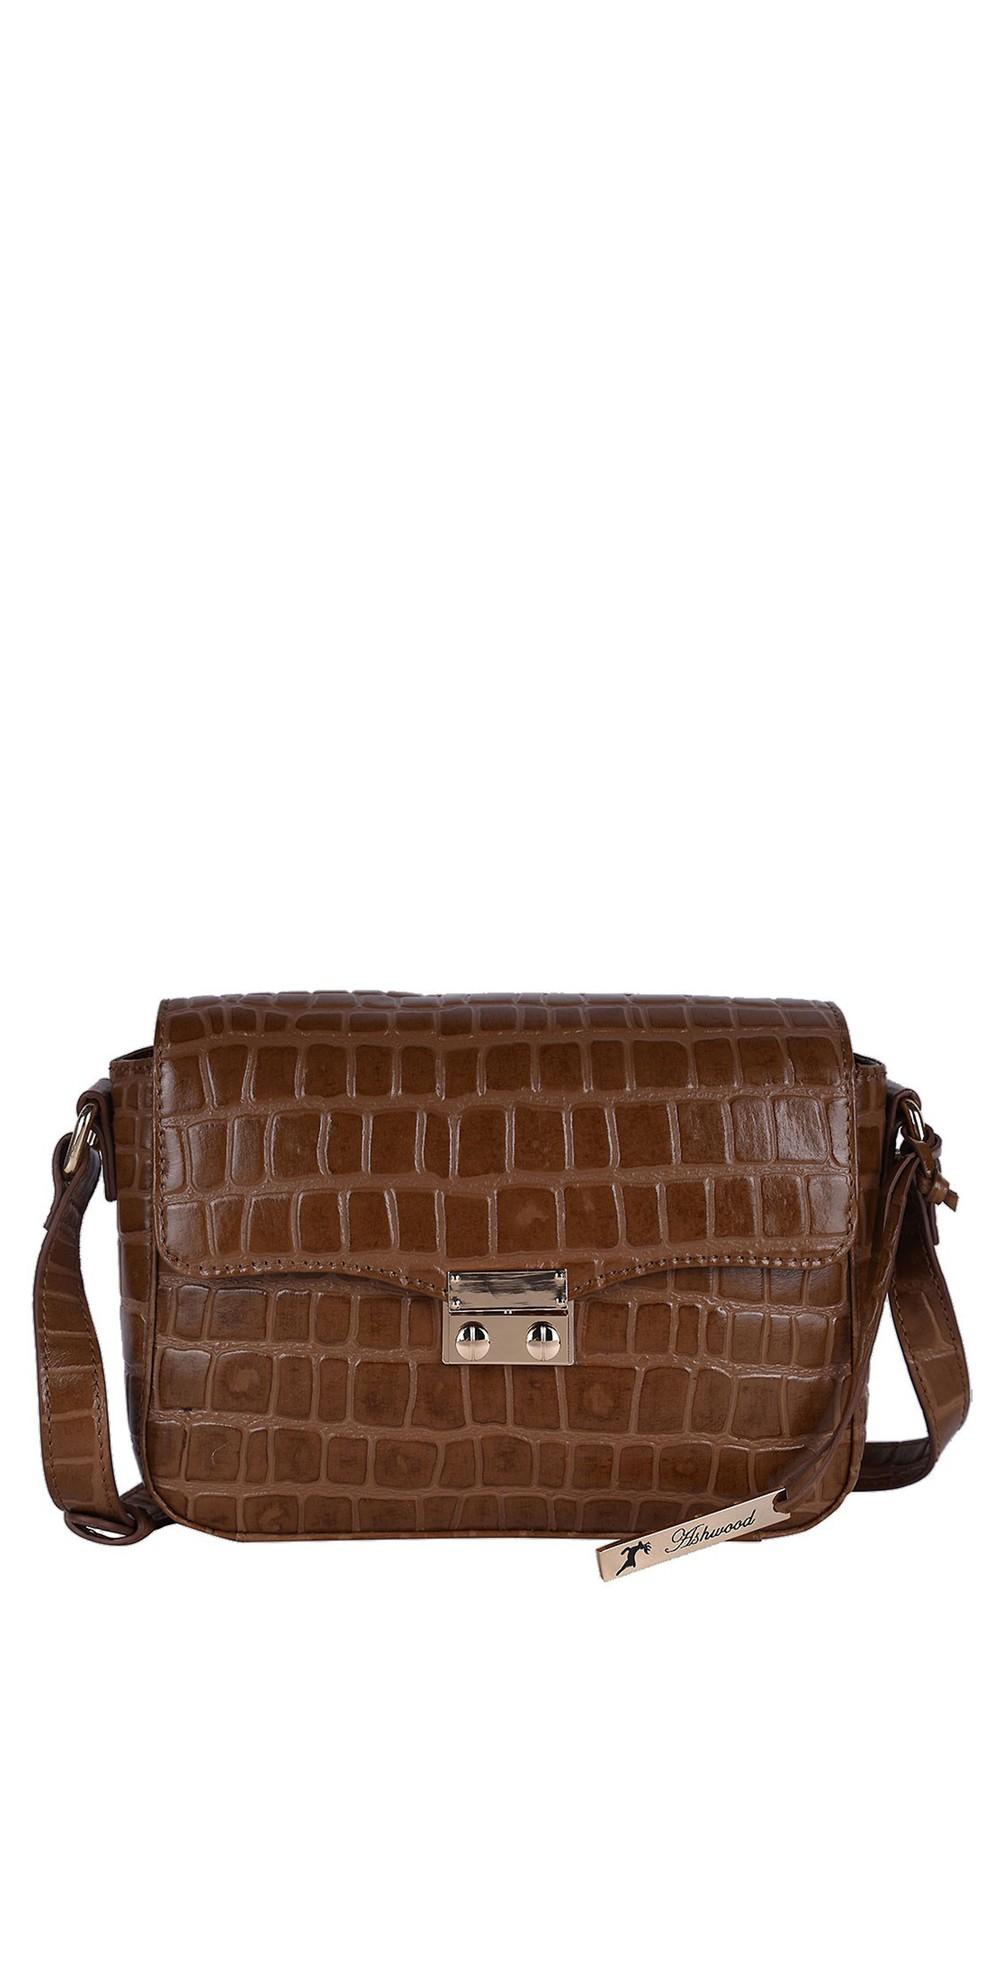 Lansdowne Cross Body Leather Bag main image